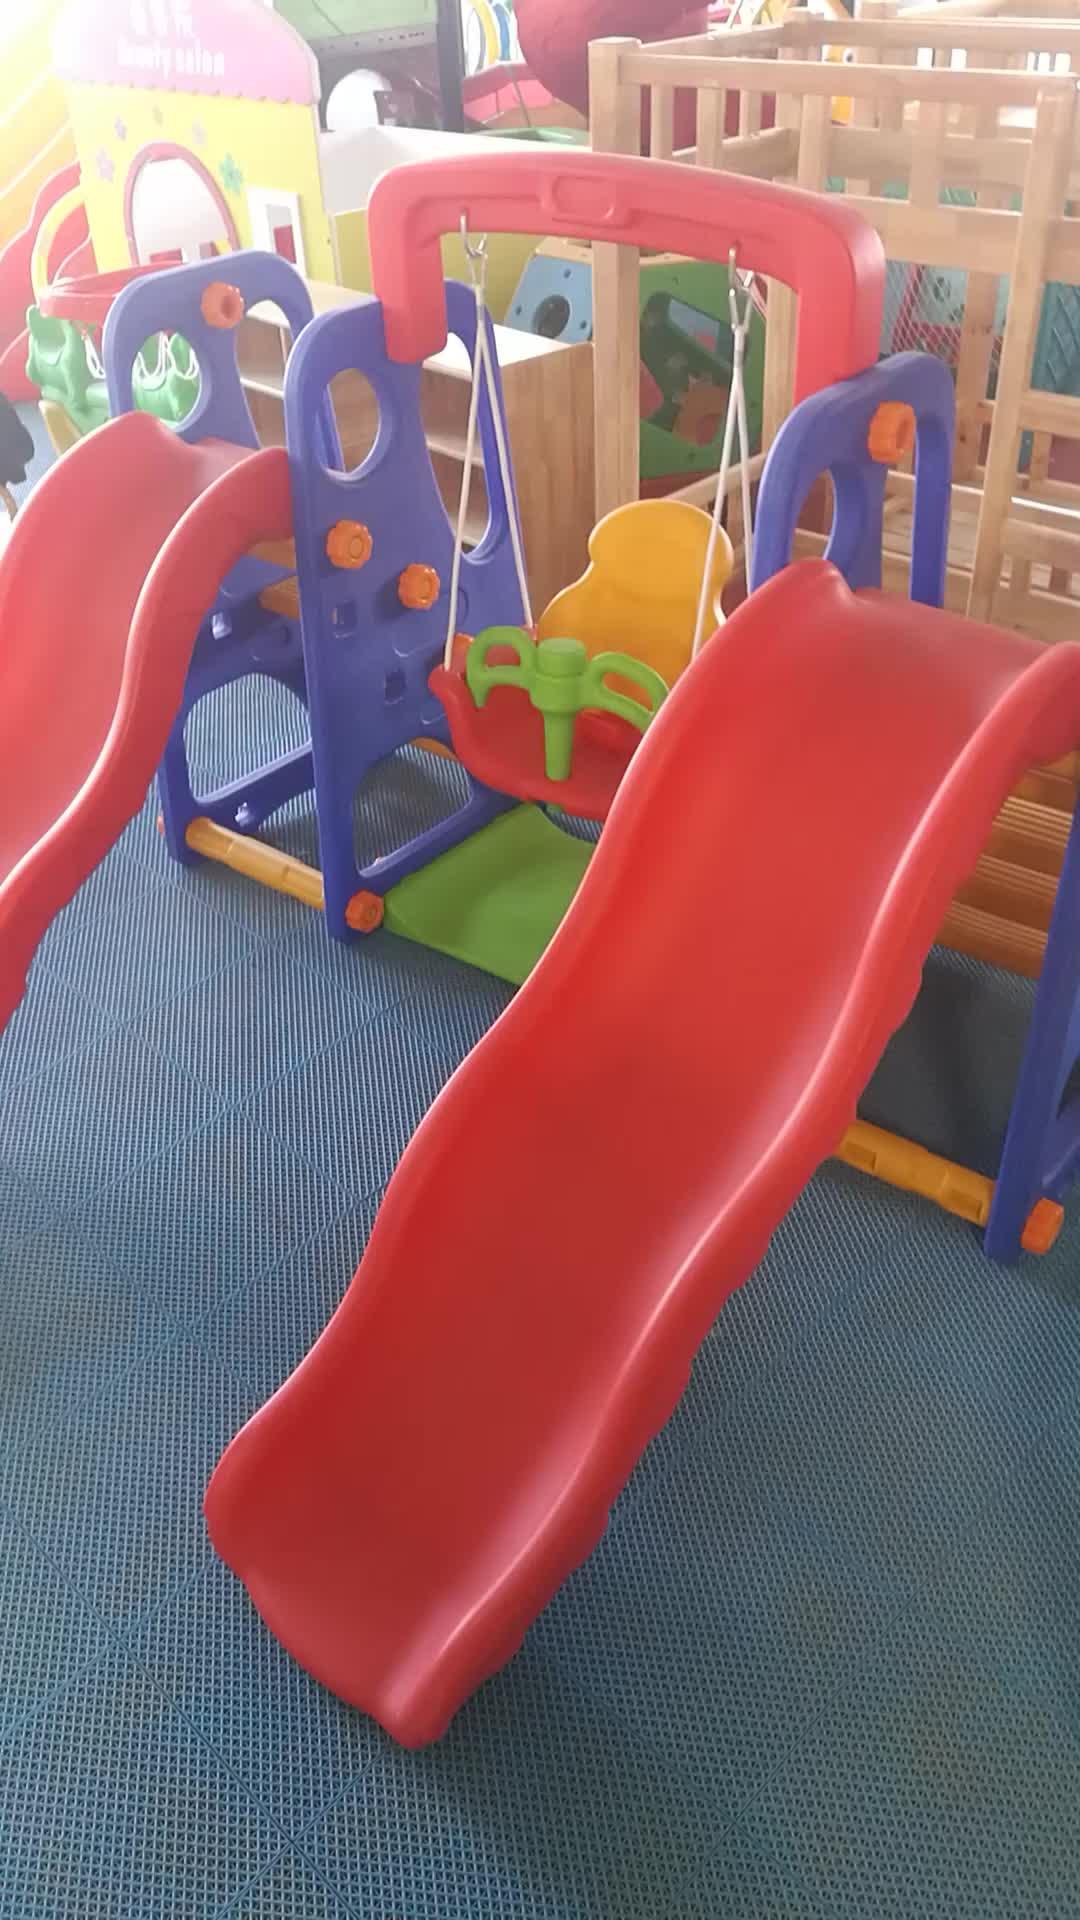 Hot selling playground indoor outdoor kids plastic slide set